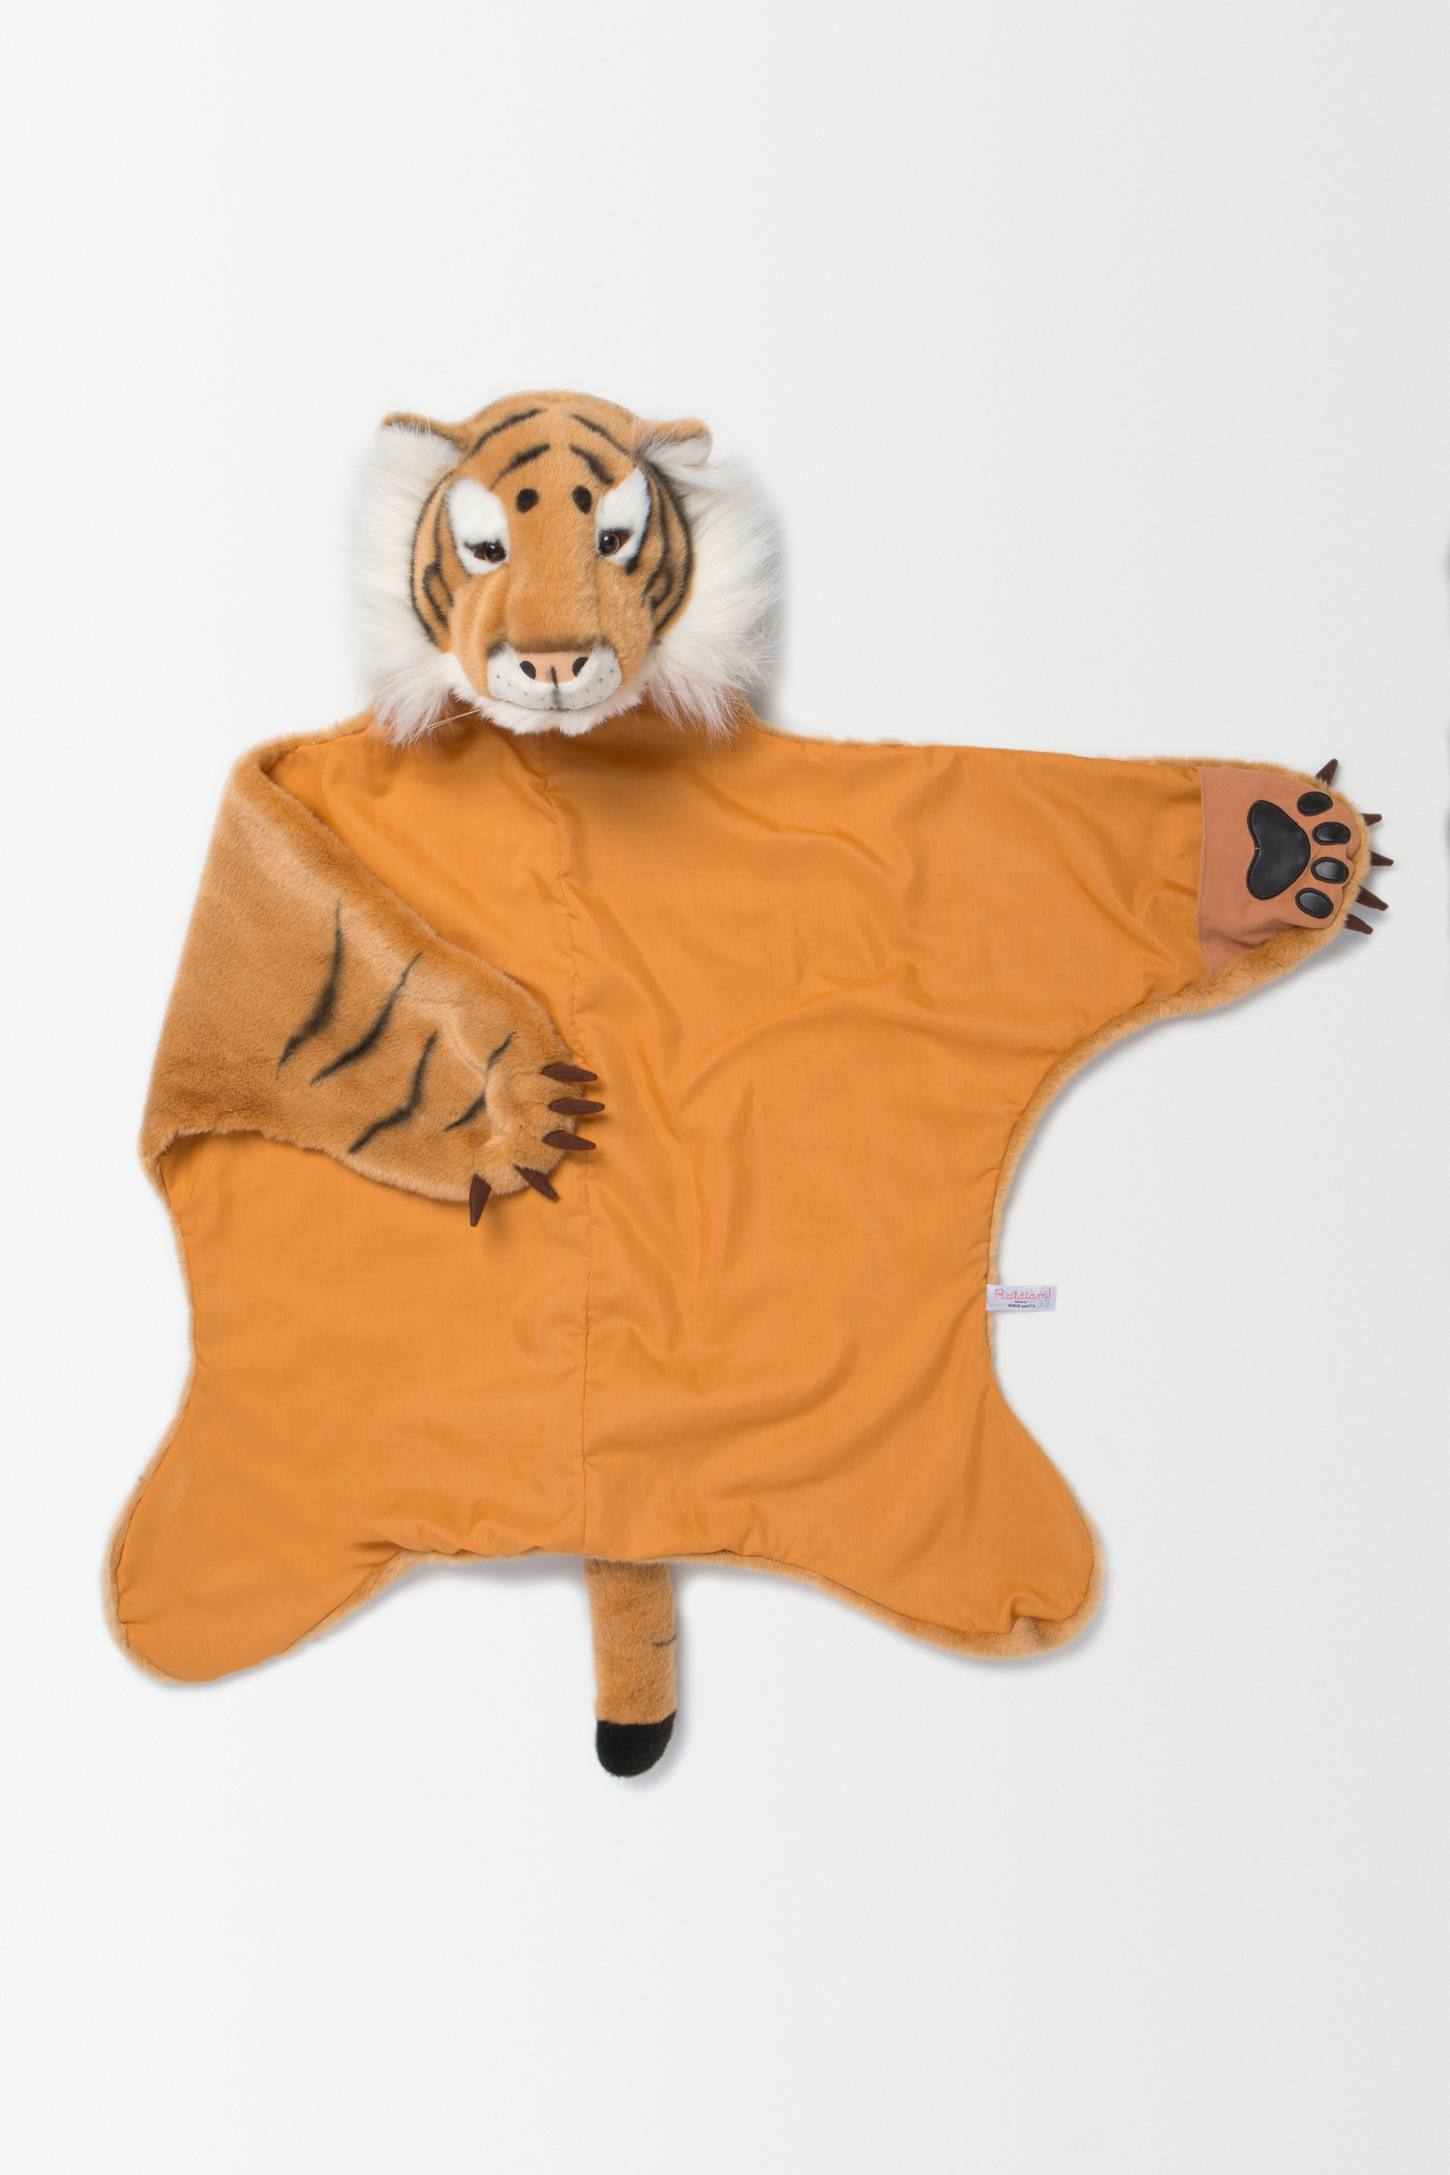 Tiger Dress Up